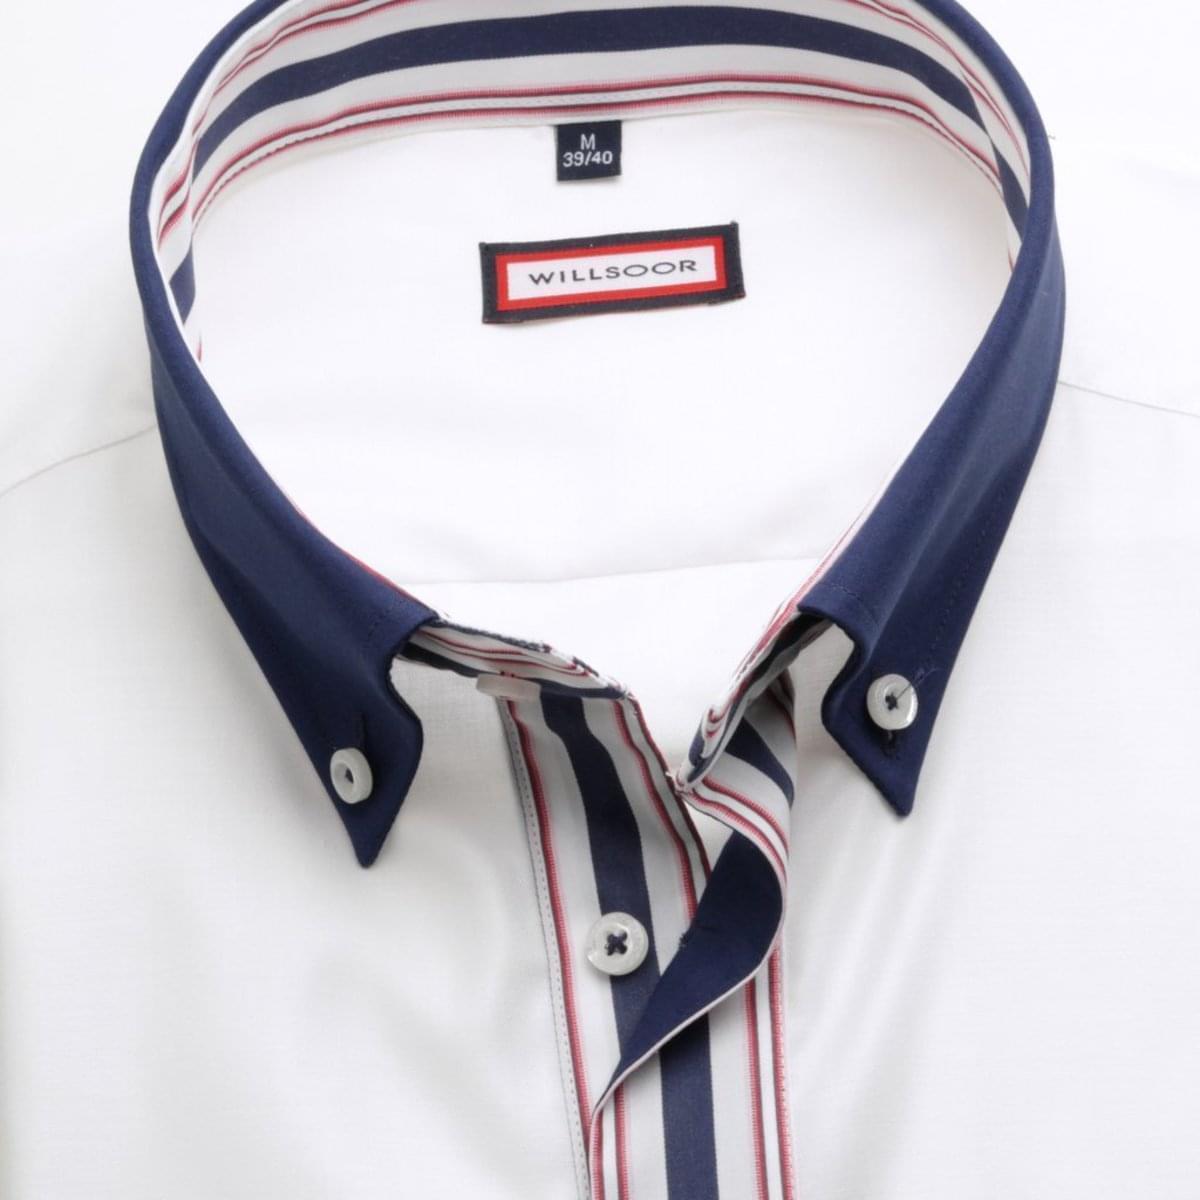 Willsoor Pánská košile WR Slim Fit (výška 176-182) 1963 176-182 / L (41/42)